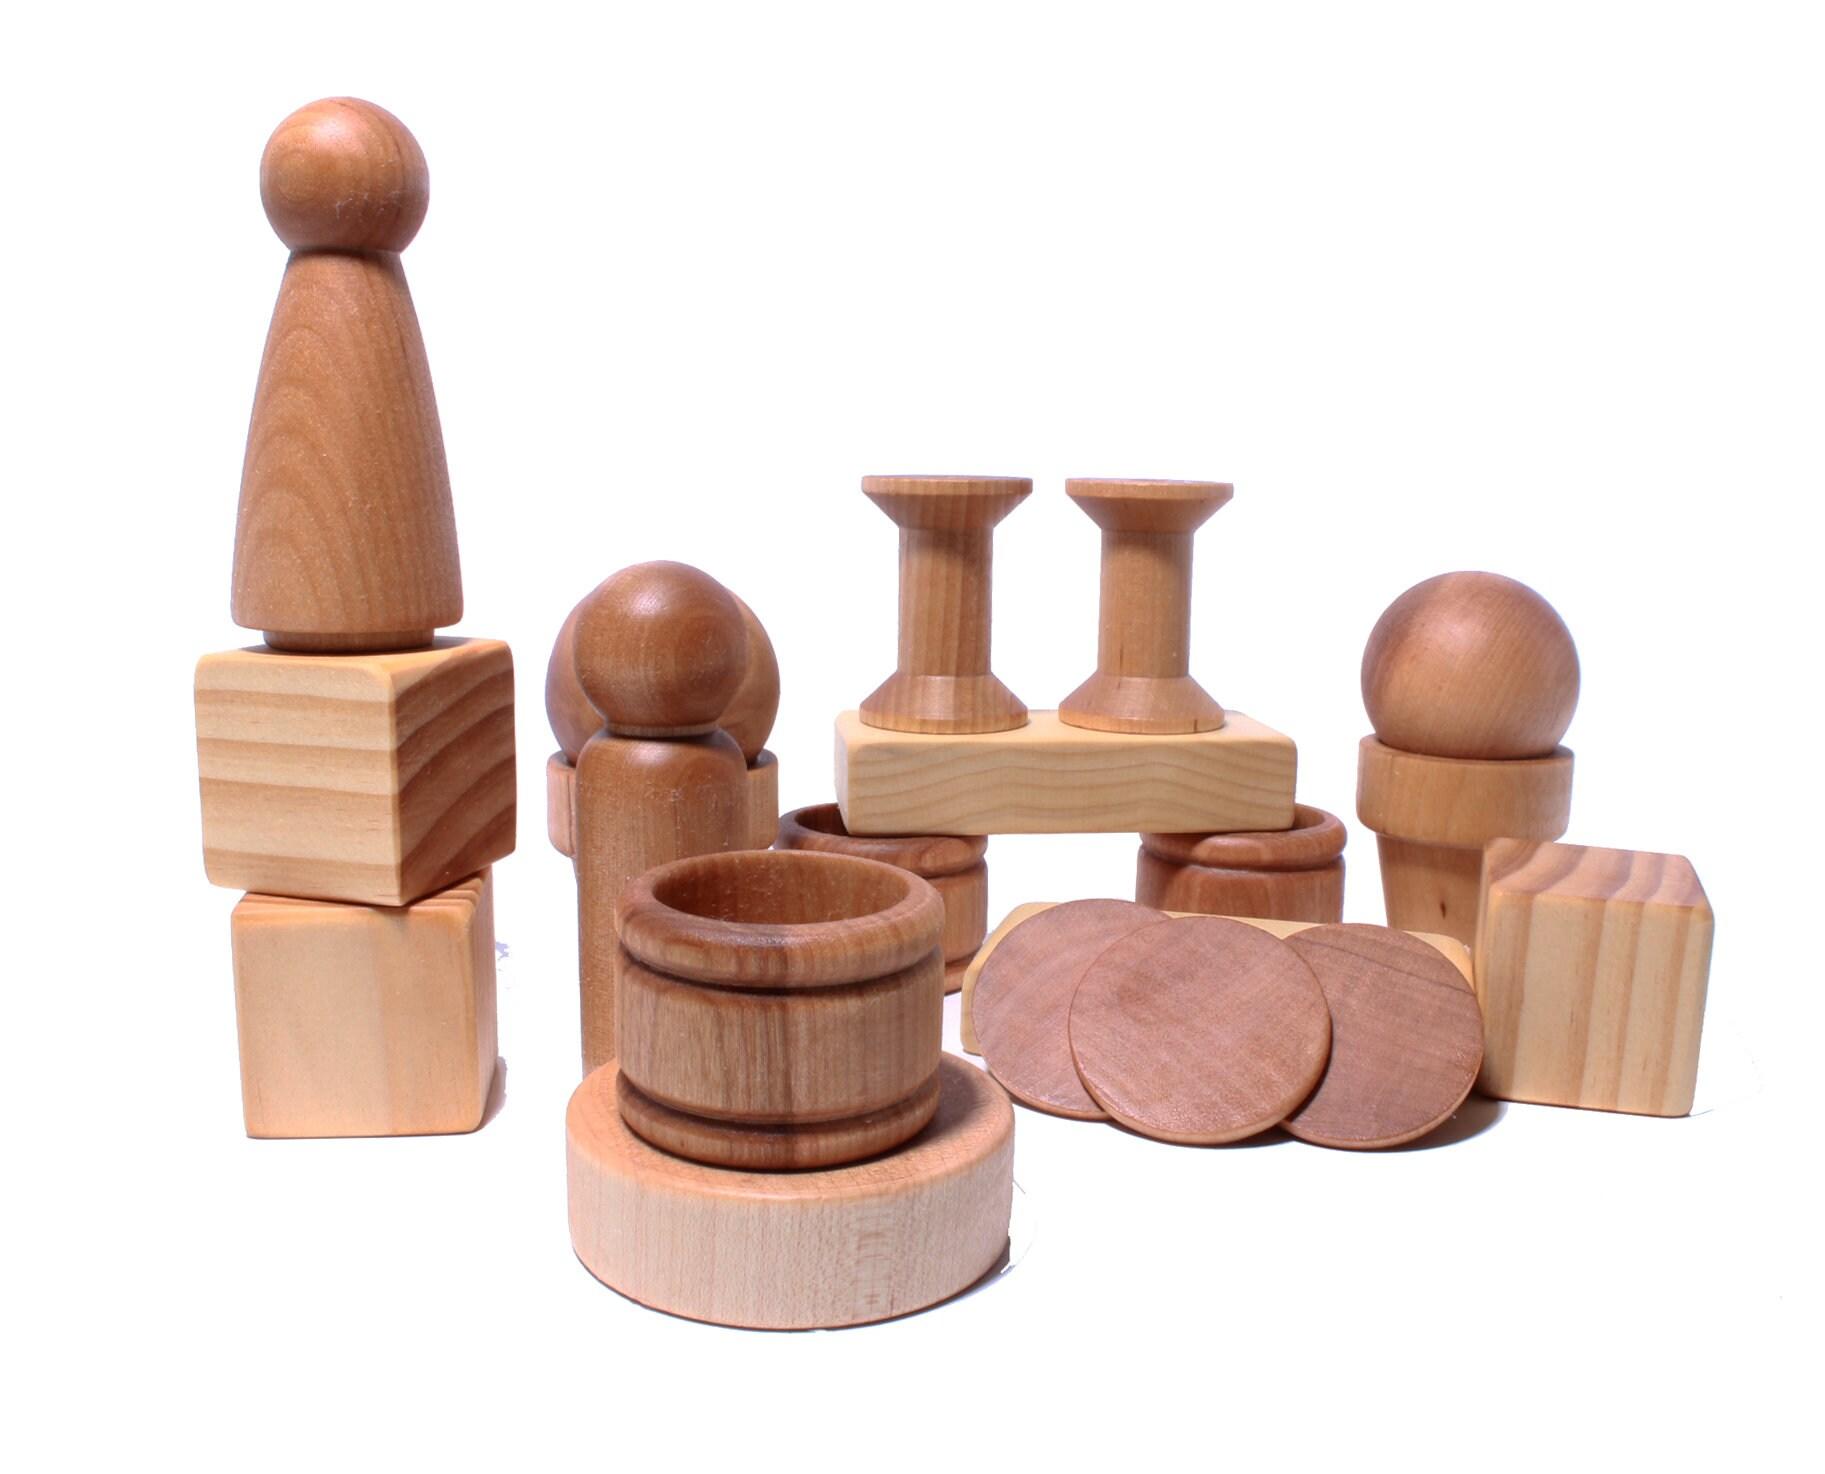 montessori loose parts baby toys - natural wooden toys - cubes, pegs,  rings, balls - waldorf natural baby toys - loose parts wooden elements